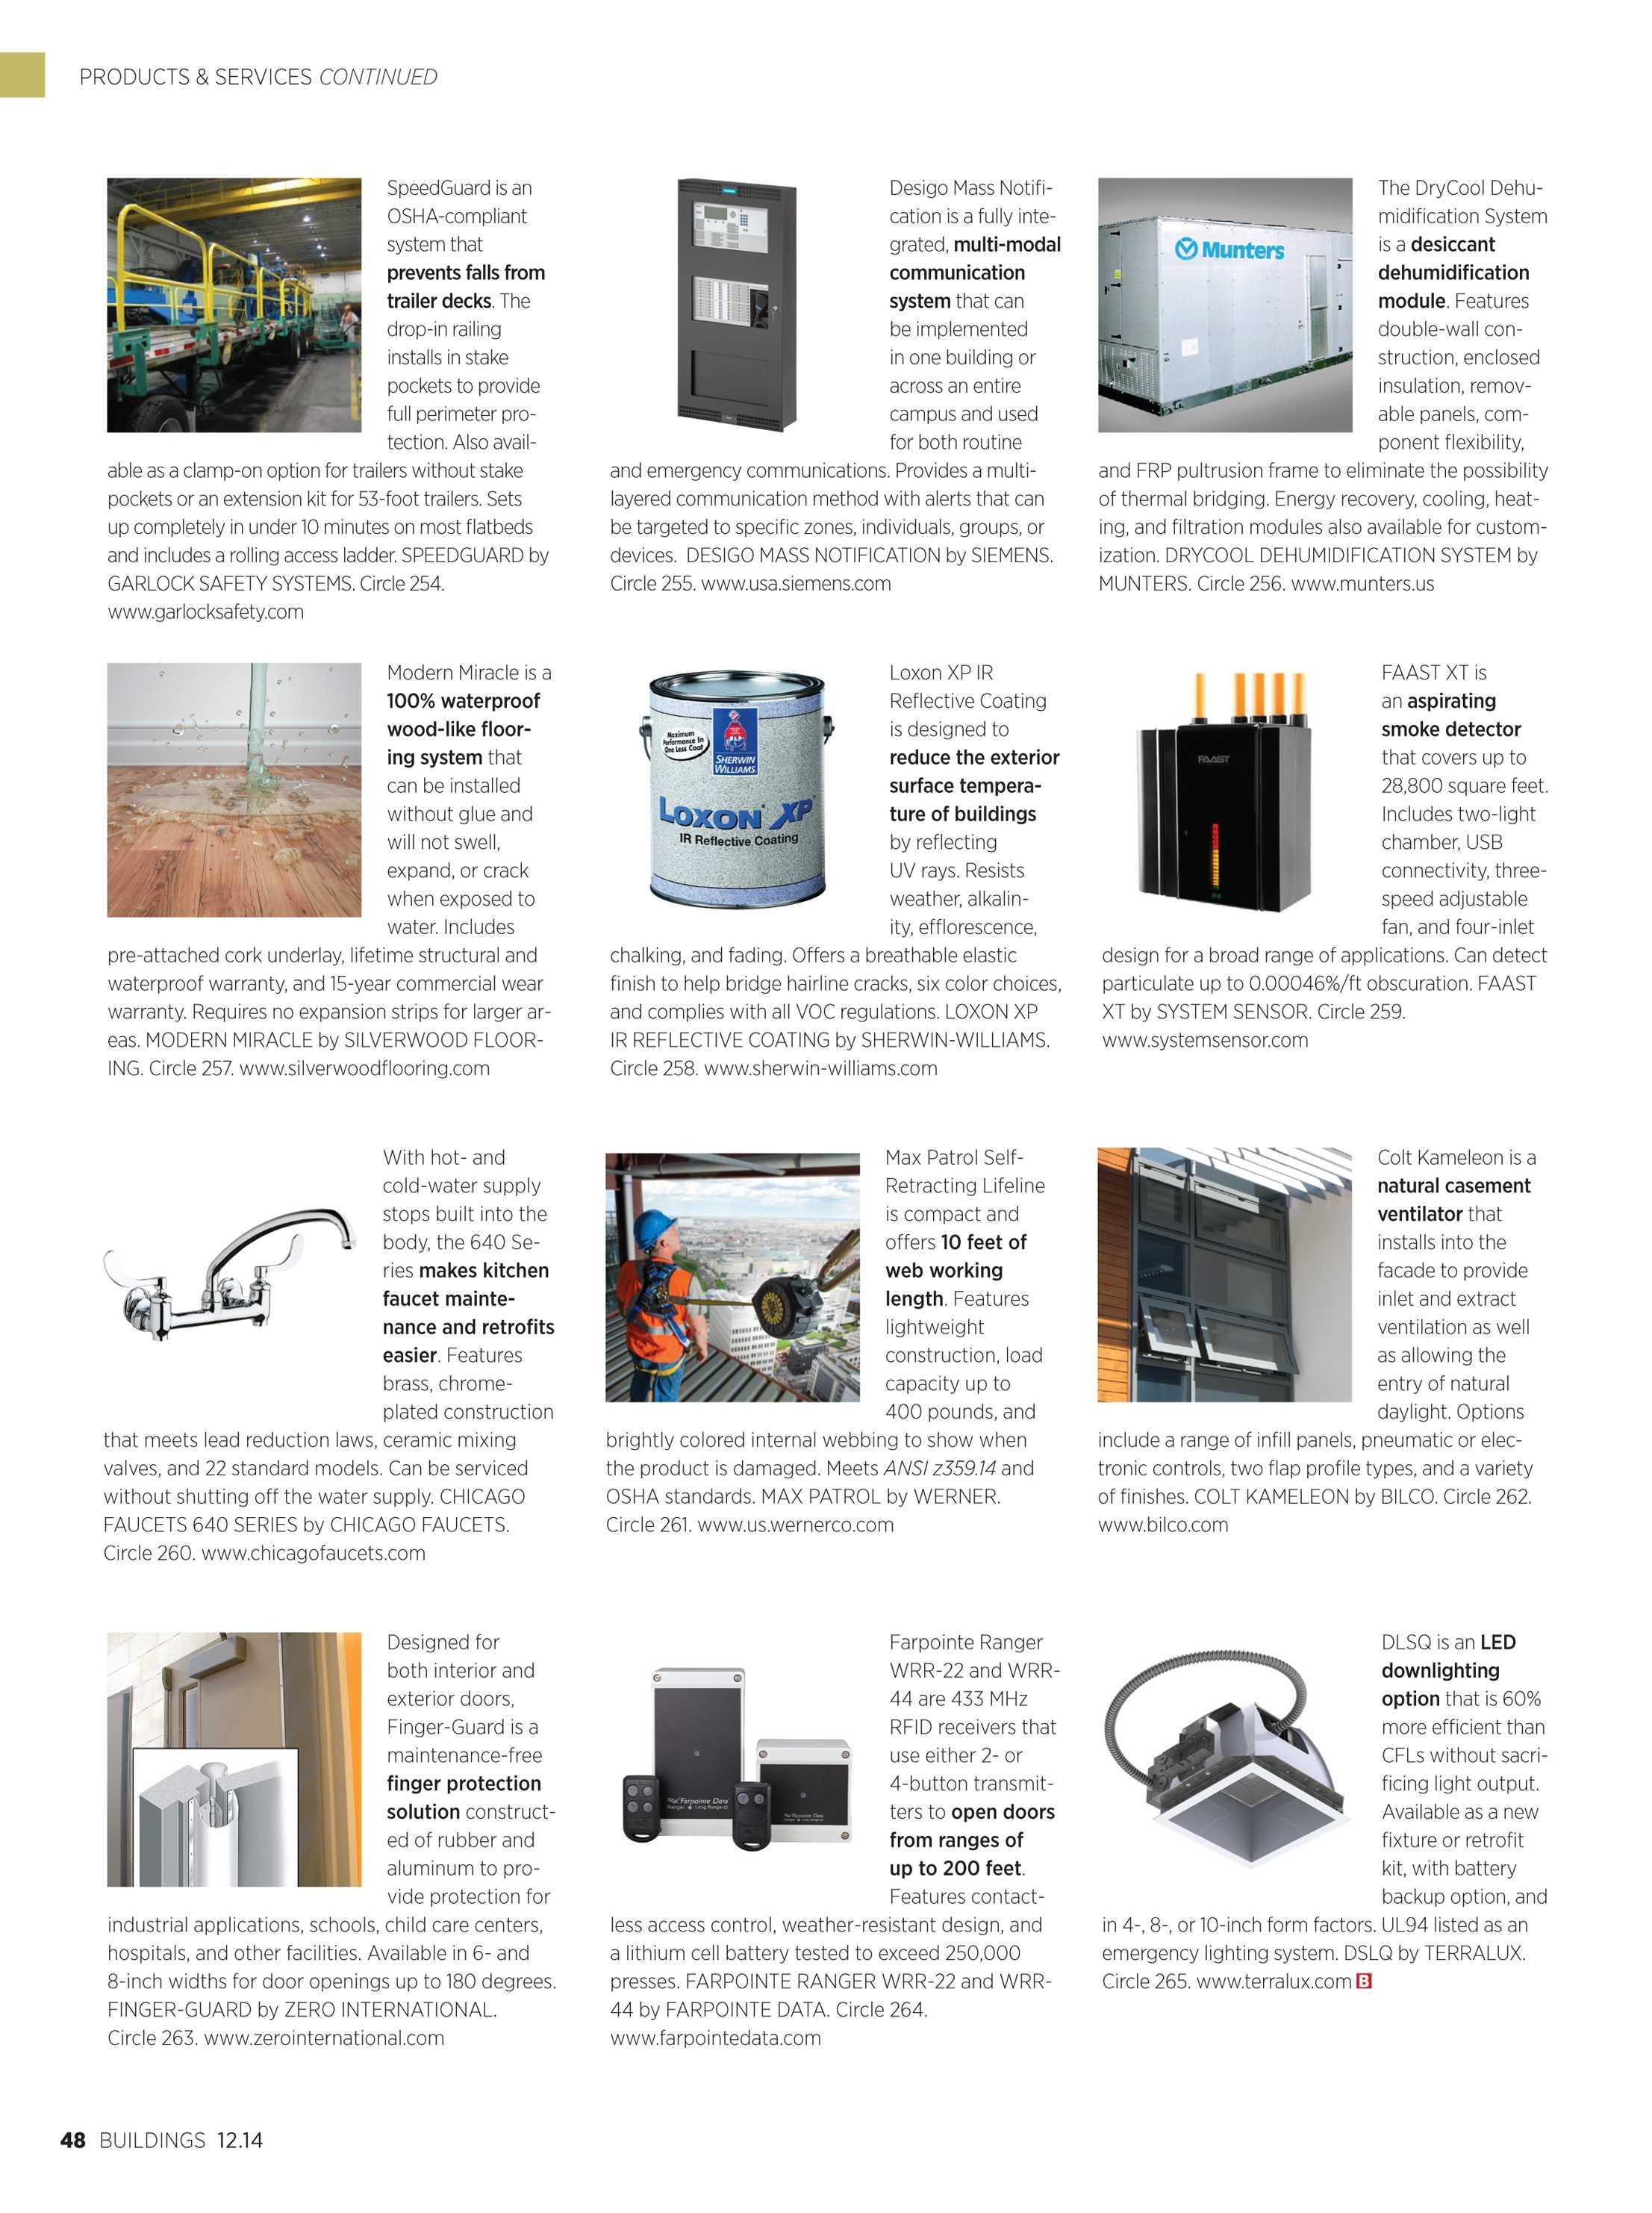 Buildings Magazine - Buildings 12/2014 - page 48